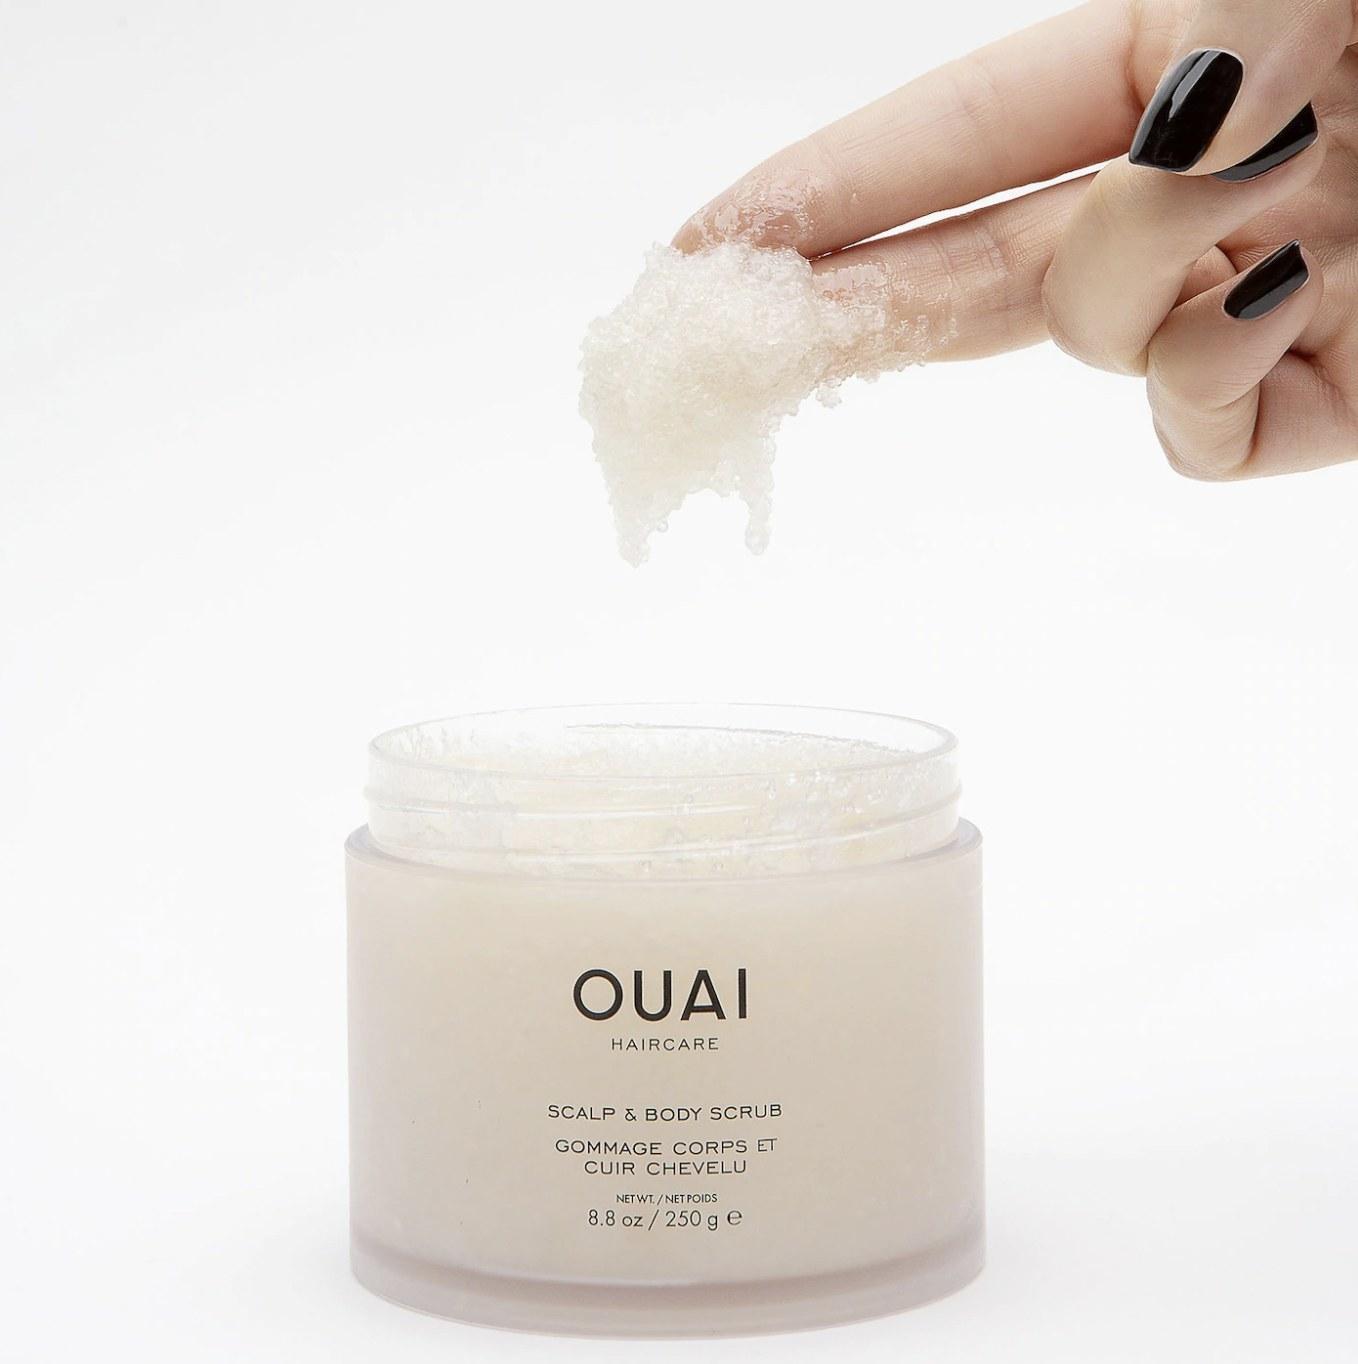 A clear jar of scalp and body scrub